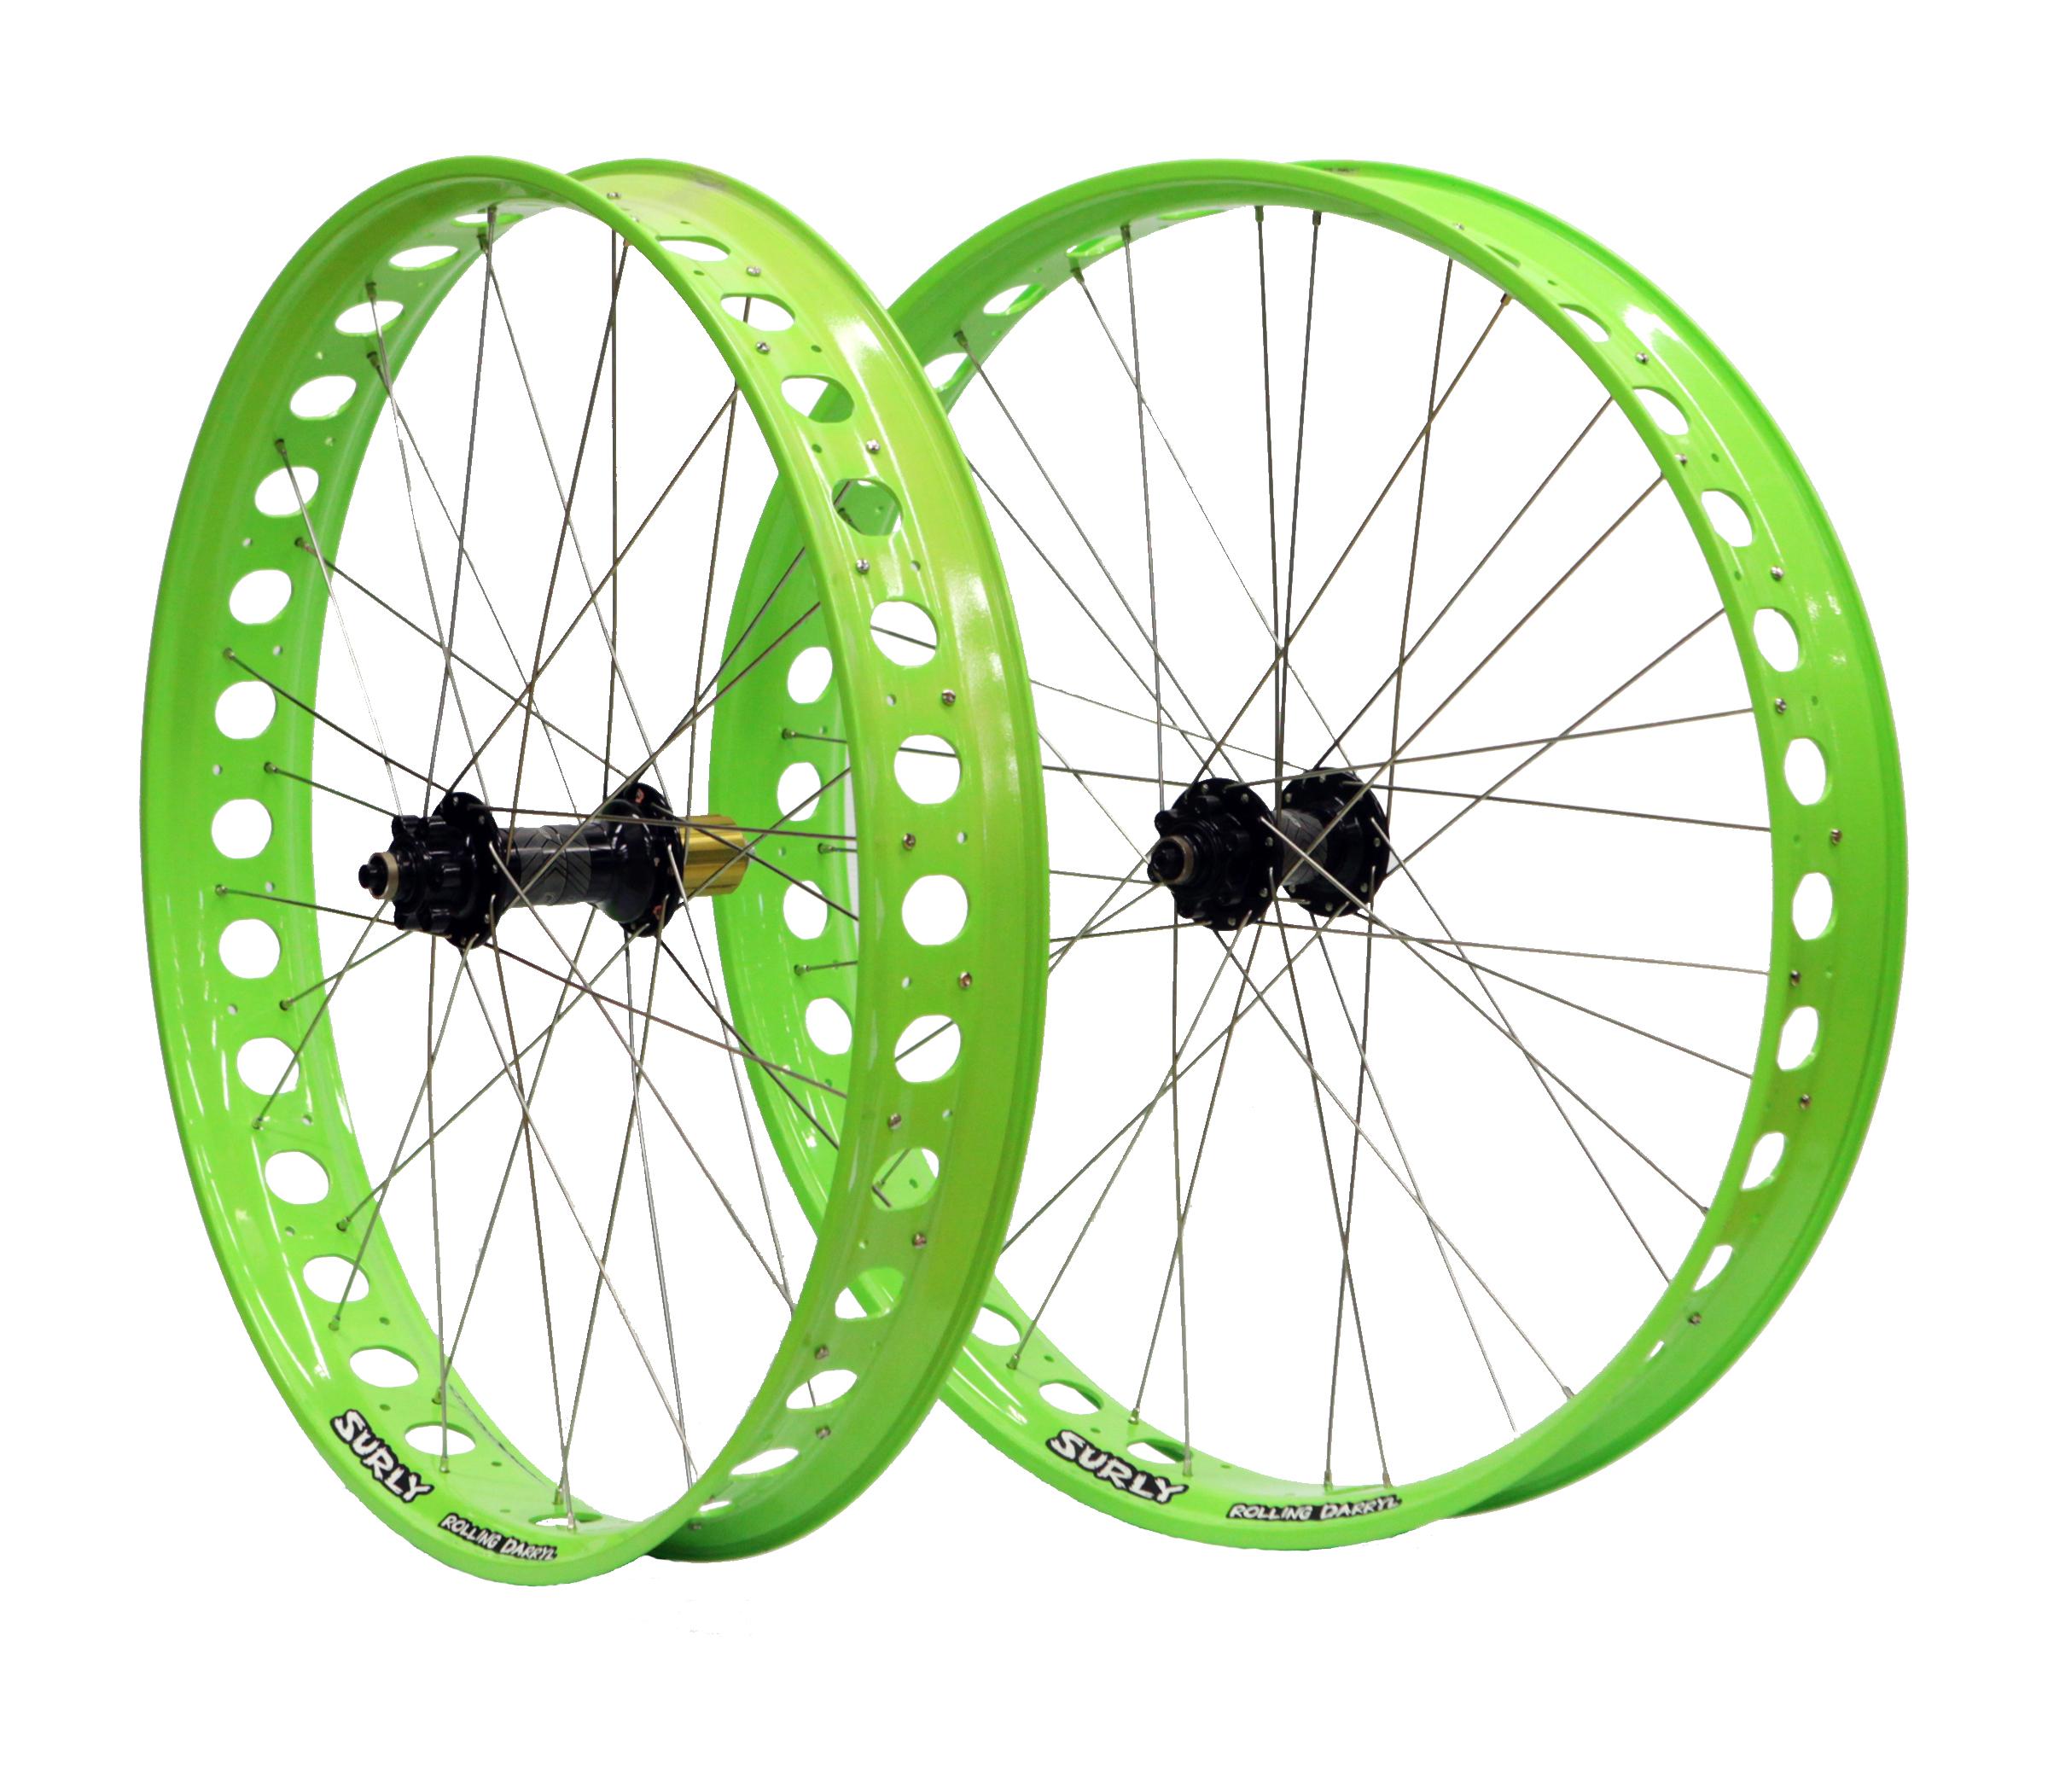 Freewheel Bike Fat Bike Wheel Set - Hope Fatsno/Surly